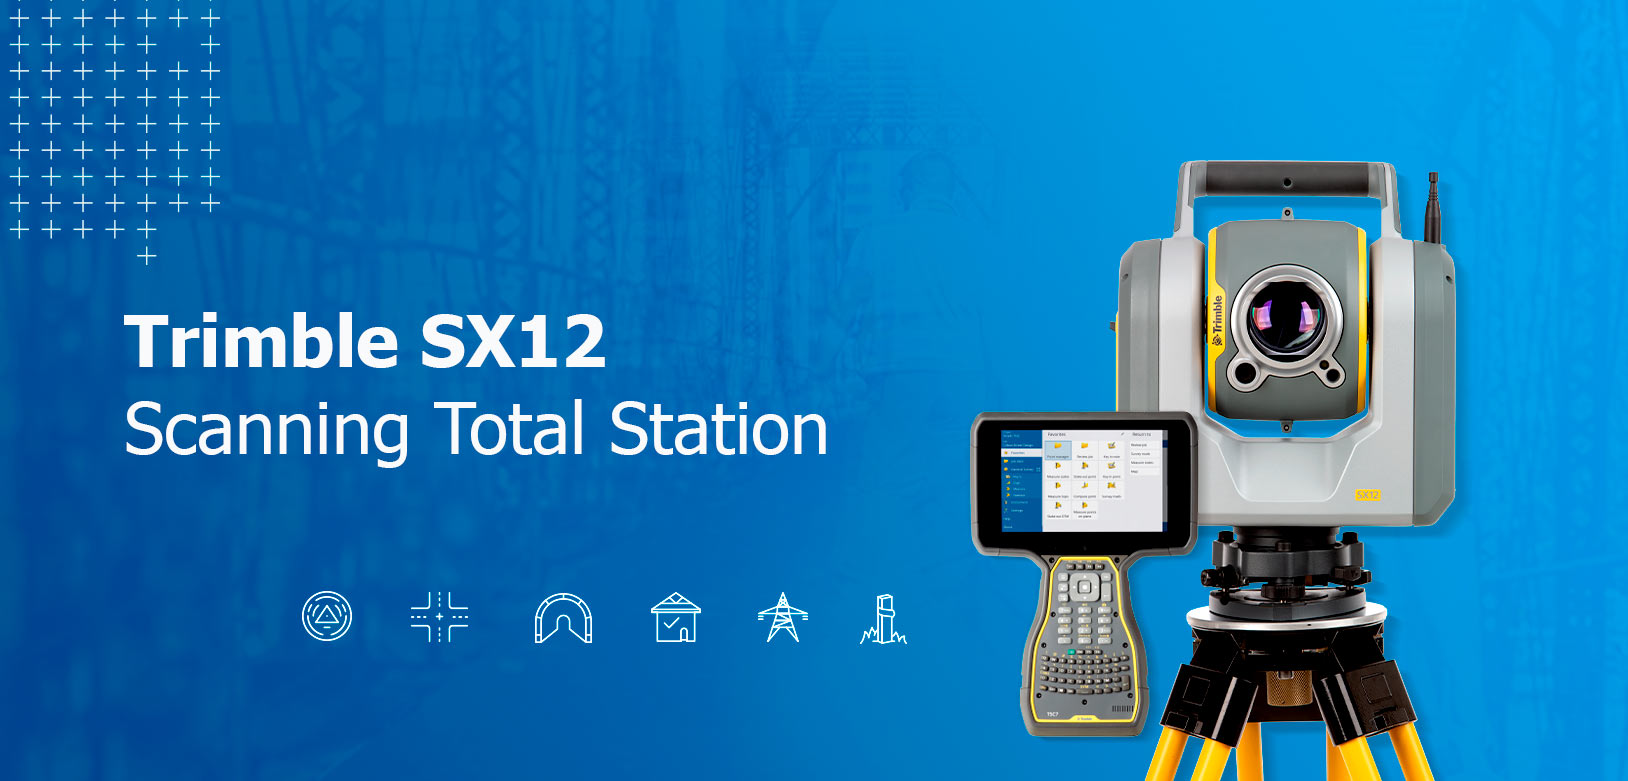 Trimble SX12 Scanning Total Station